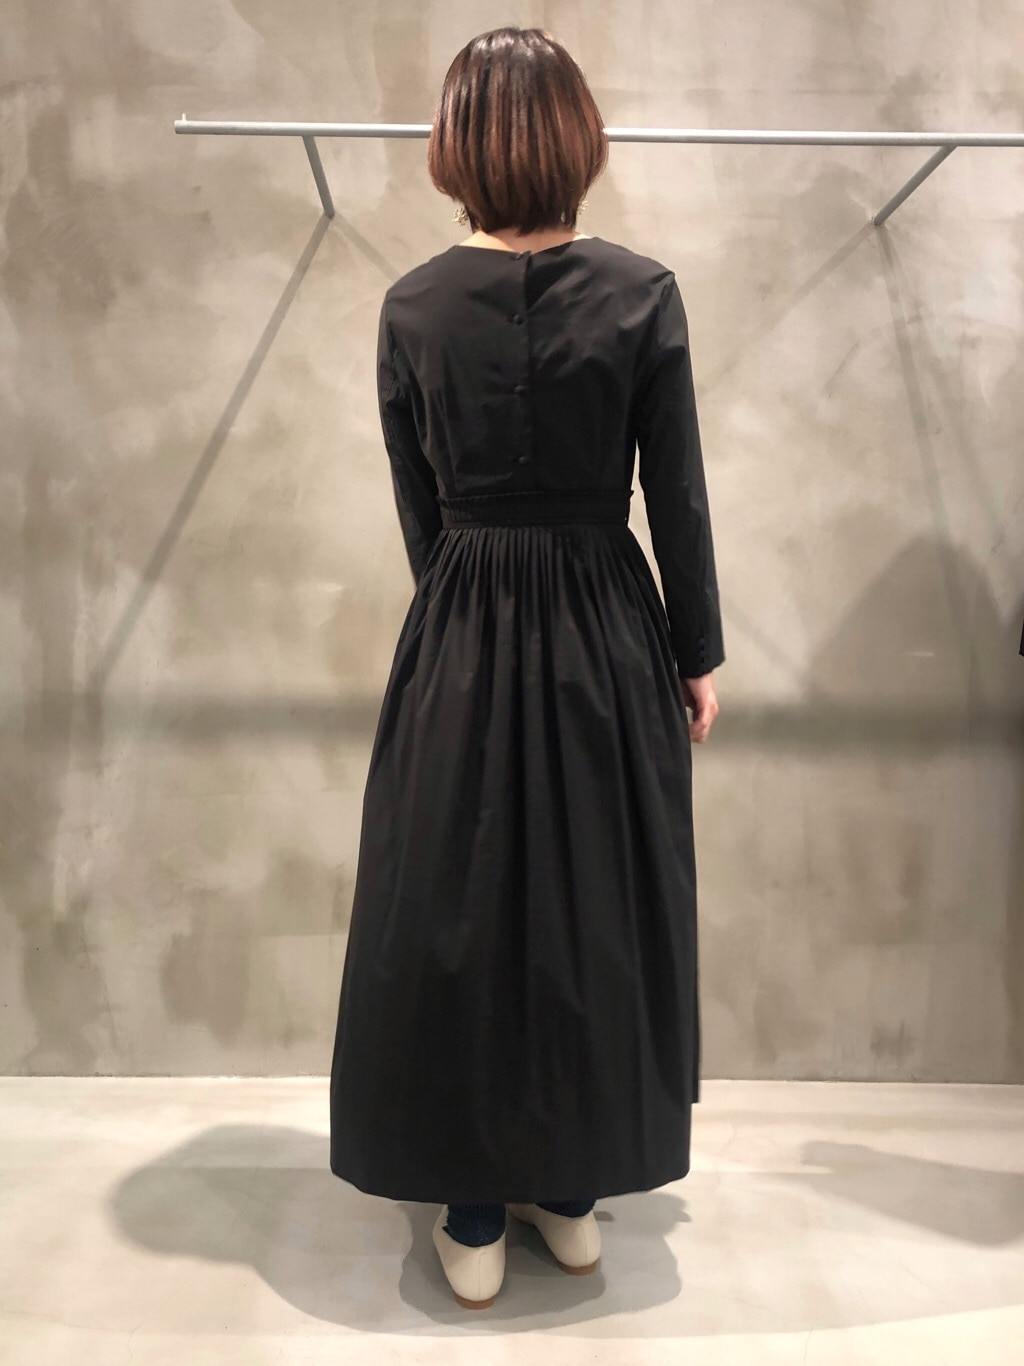 bulle de savon 渋谷スクランブルスクエア 身長:159cm 2020.03.24